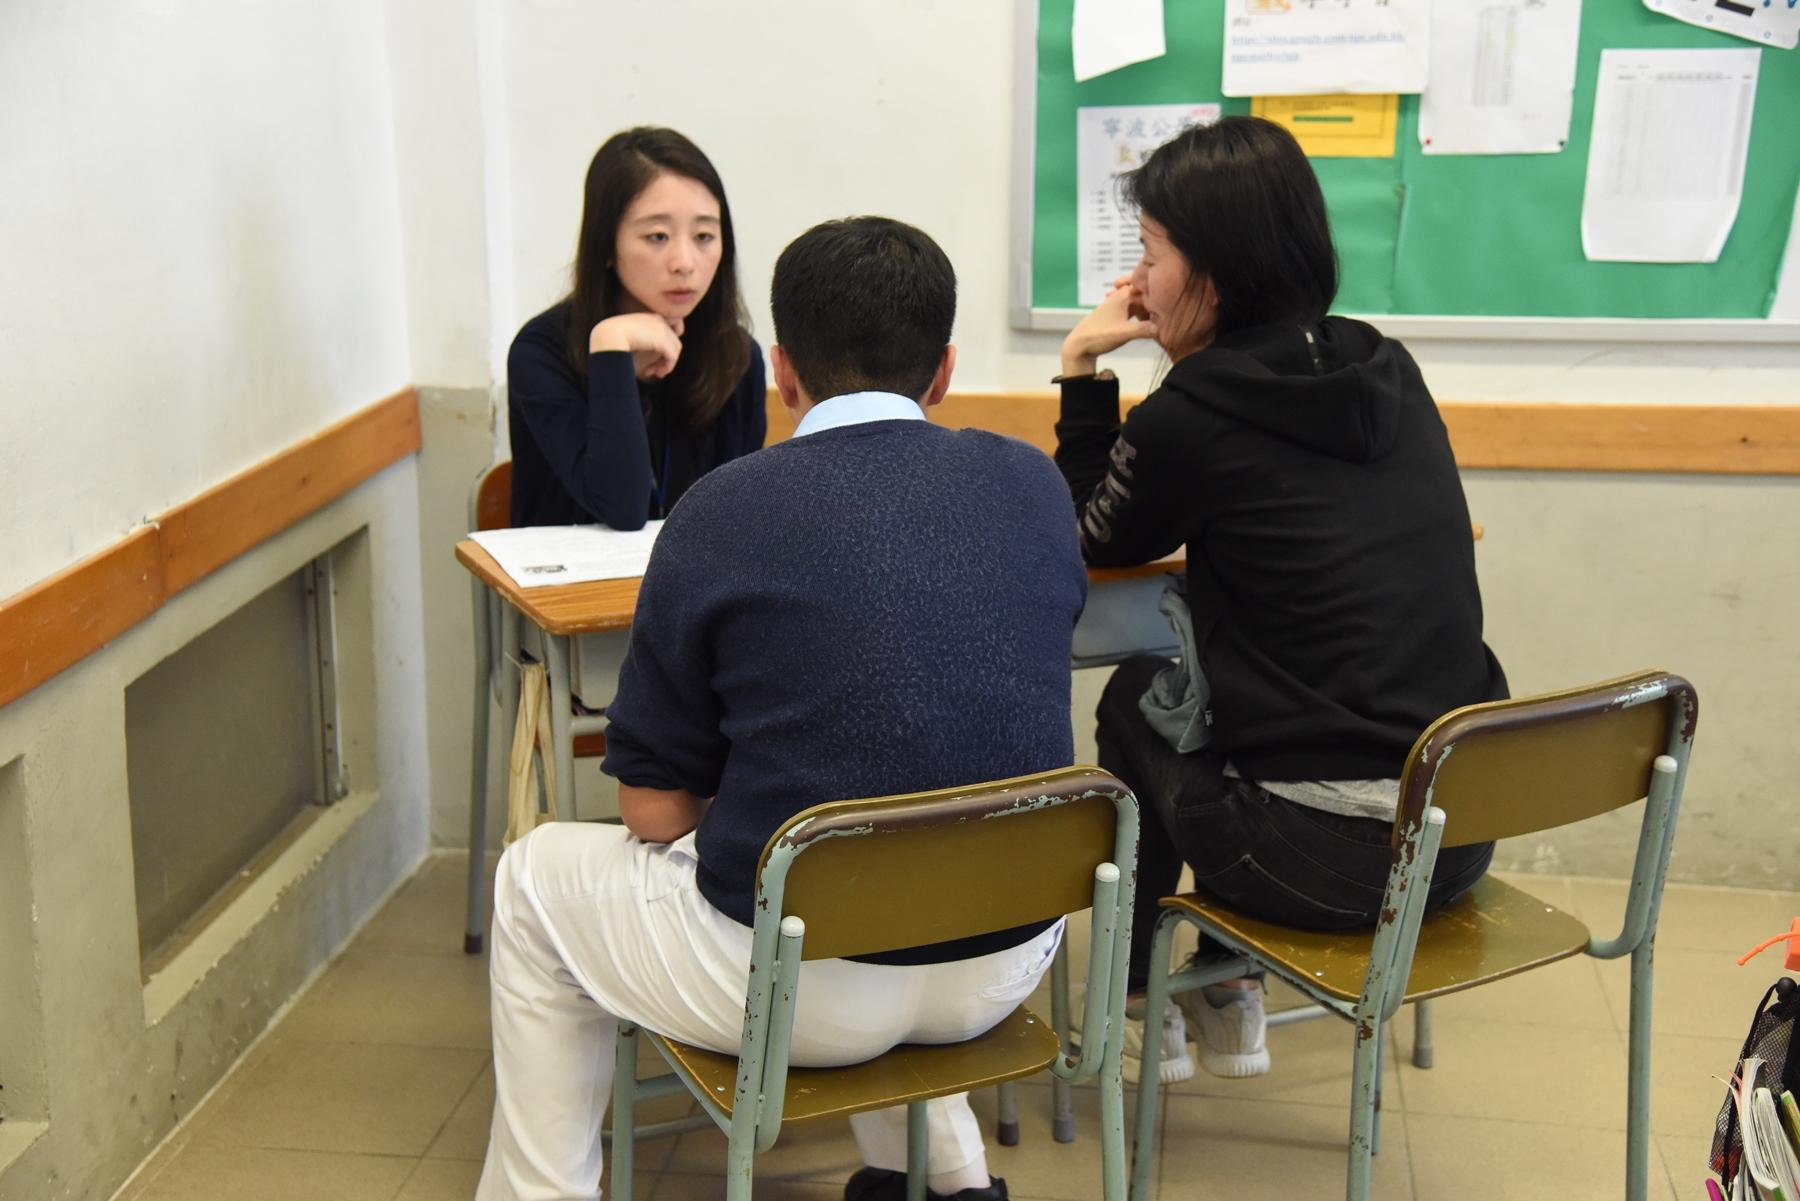 http://npc.edu.hk/sites/default/files/dsc_9589.jpg